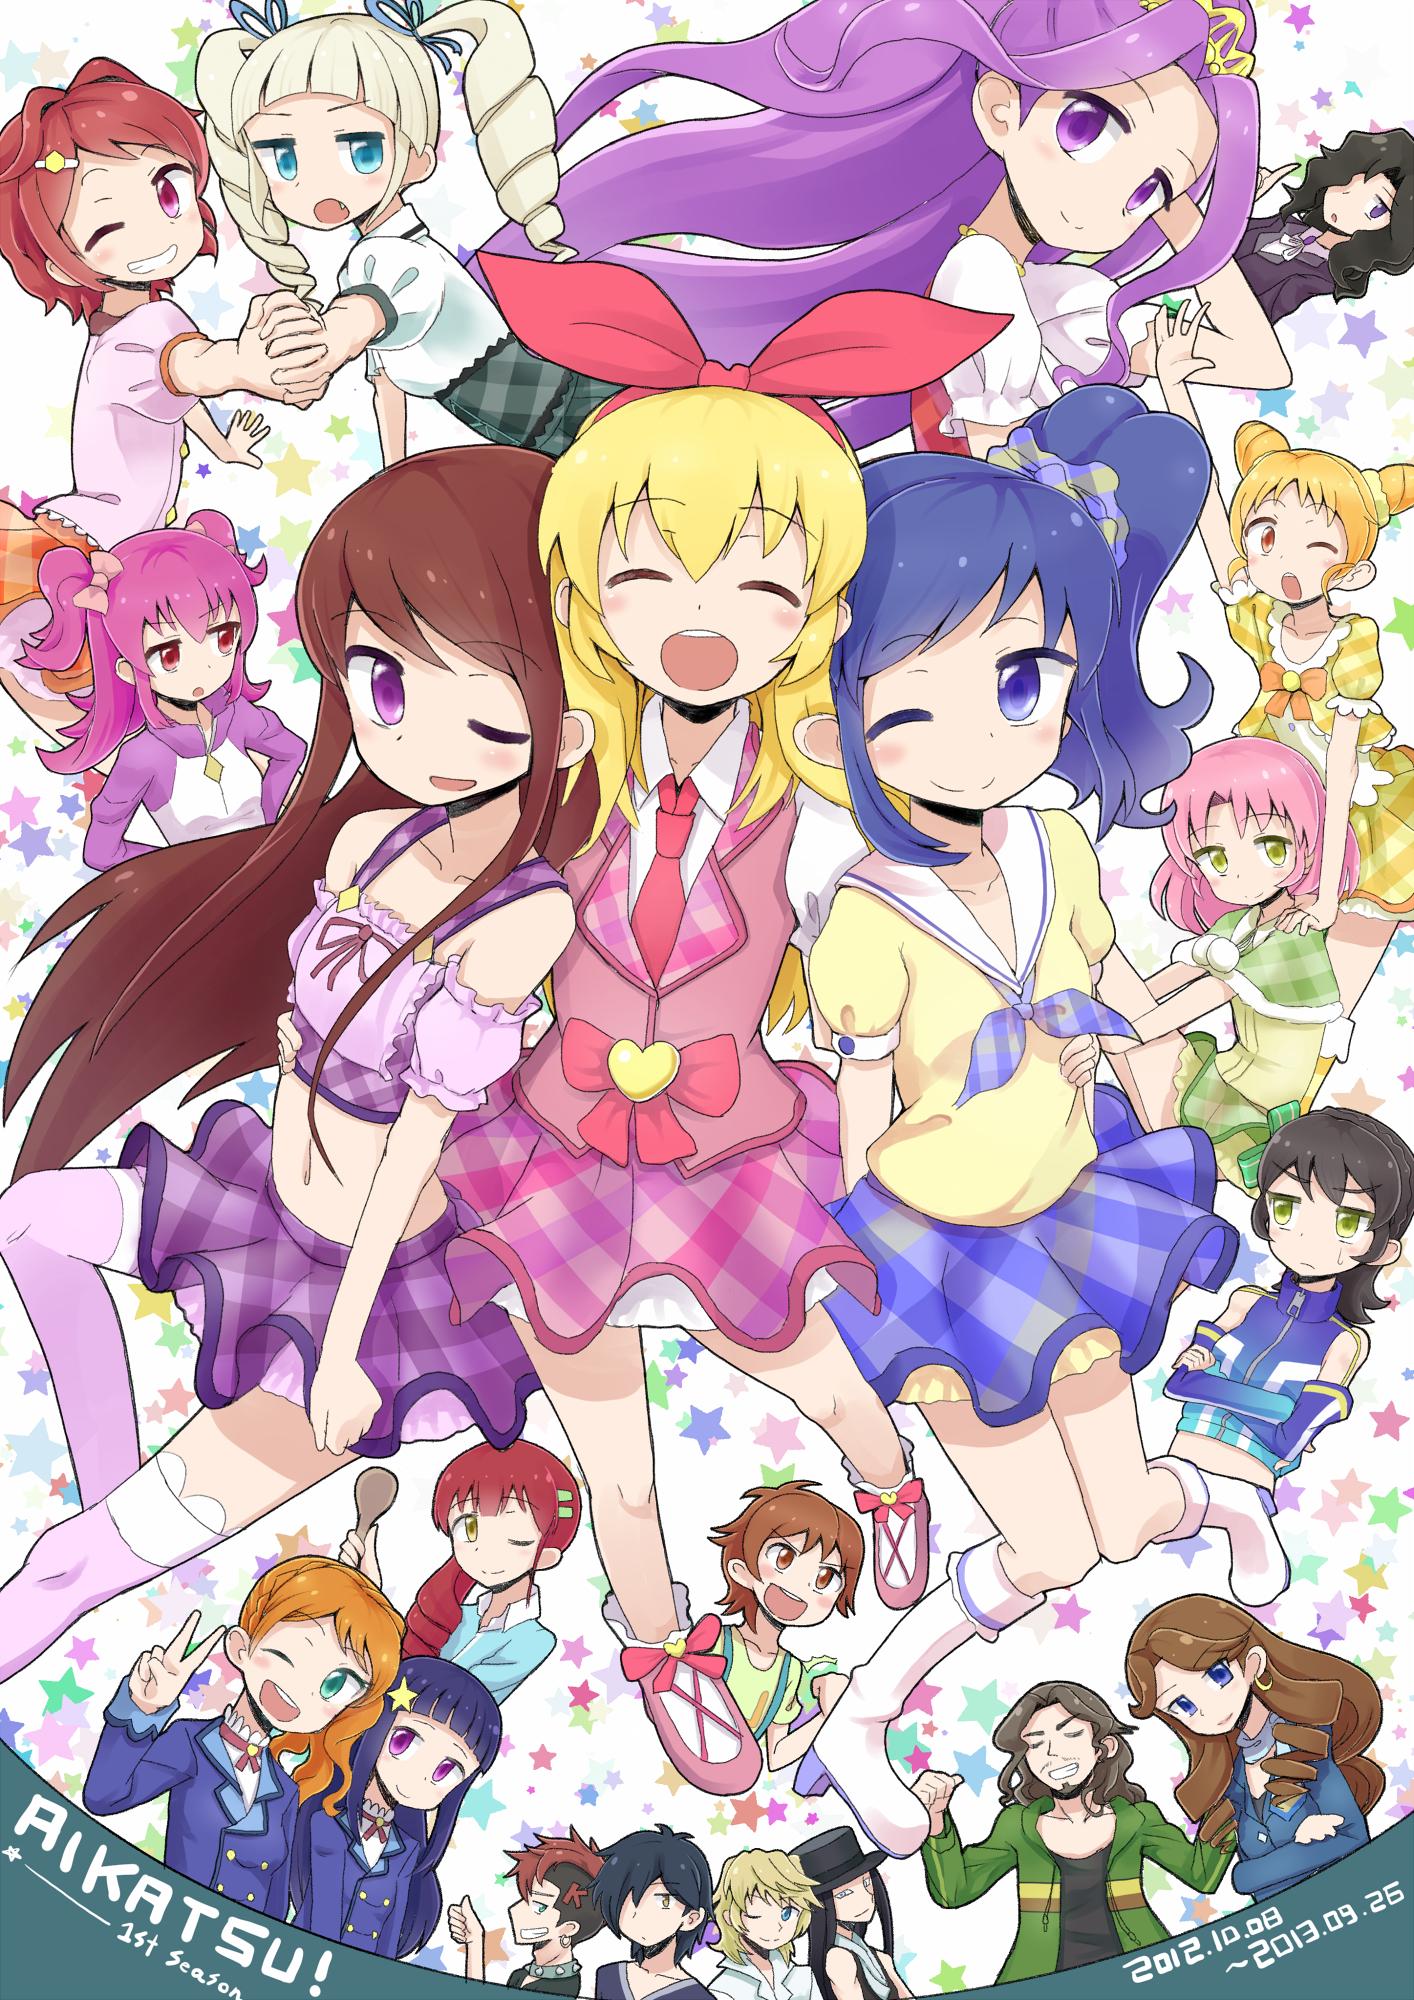 Aikatsu Image 1600685 Zerochan Anime Image Board